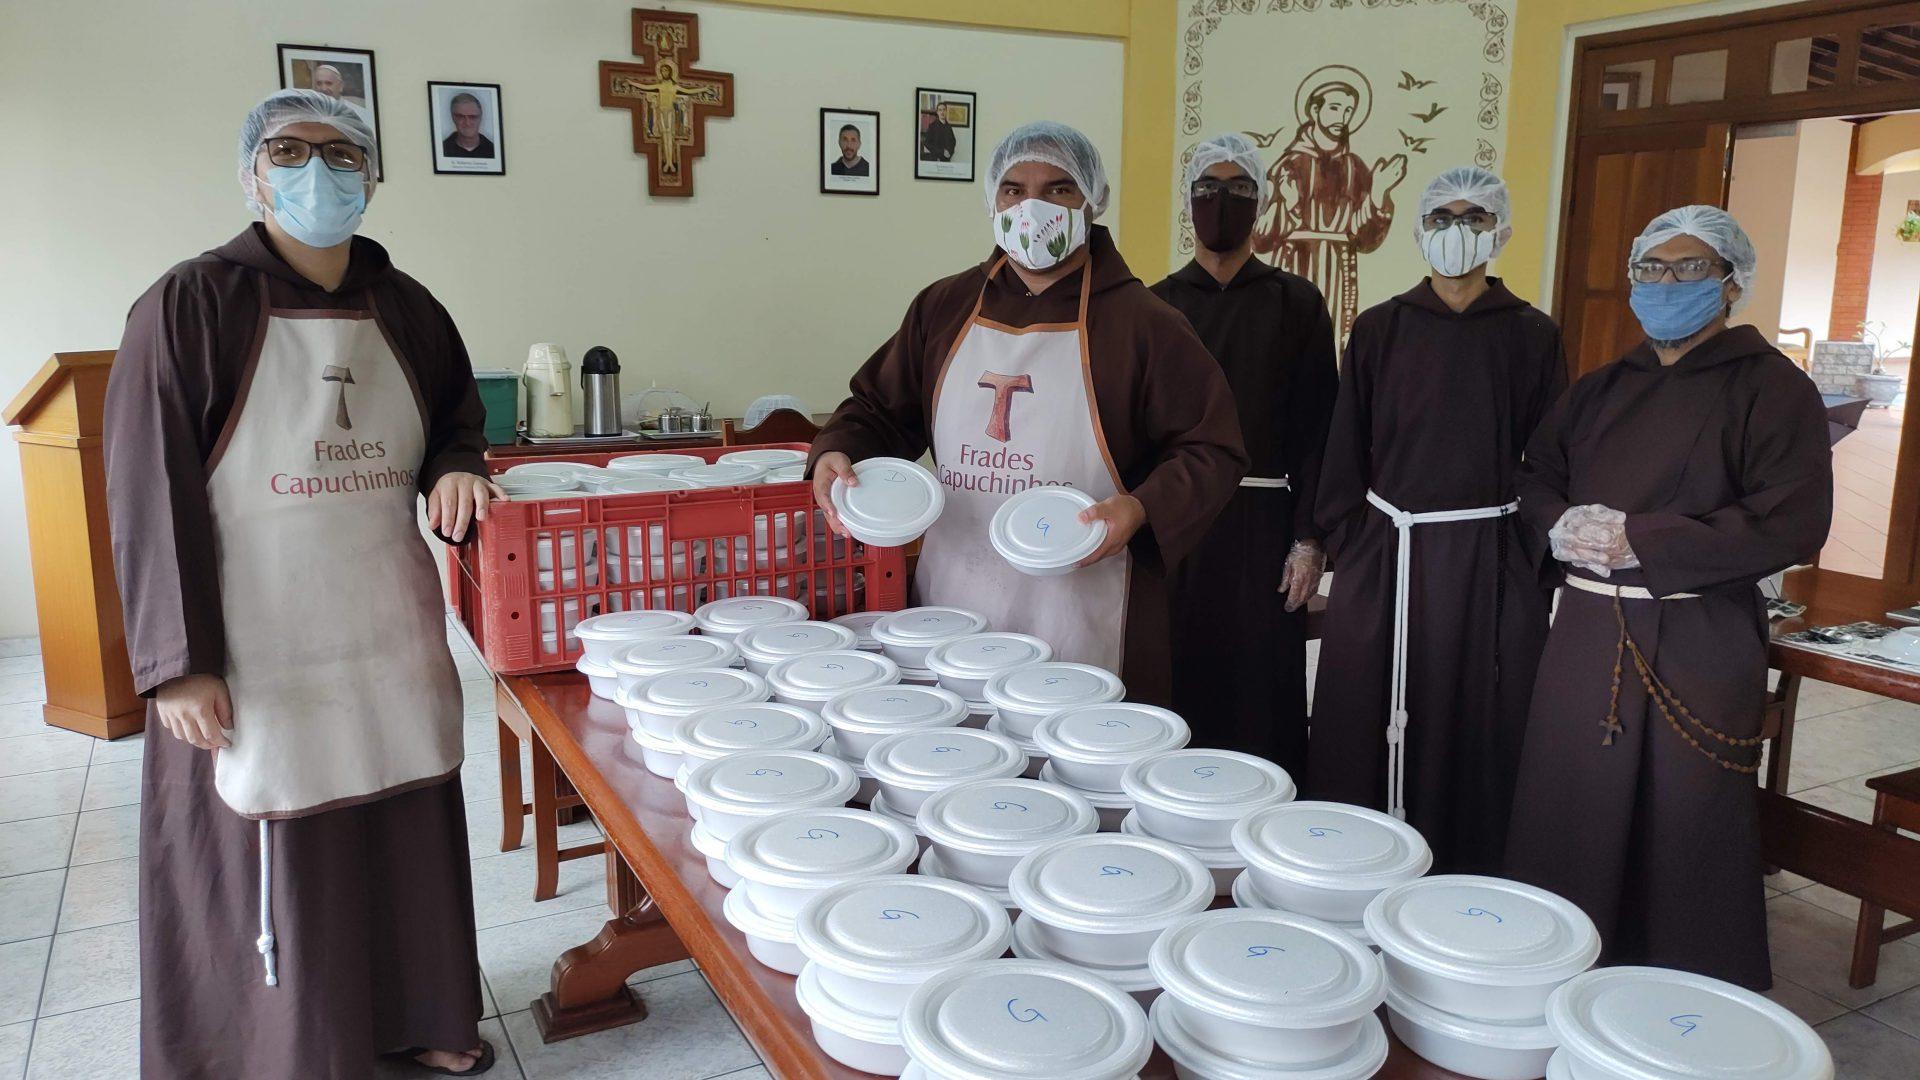 Freis jovens doações pandemia Manaus fotos Dimitri 2021 (16)